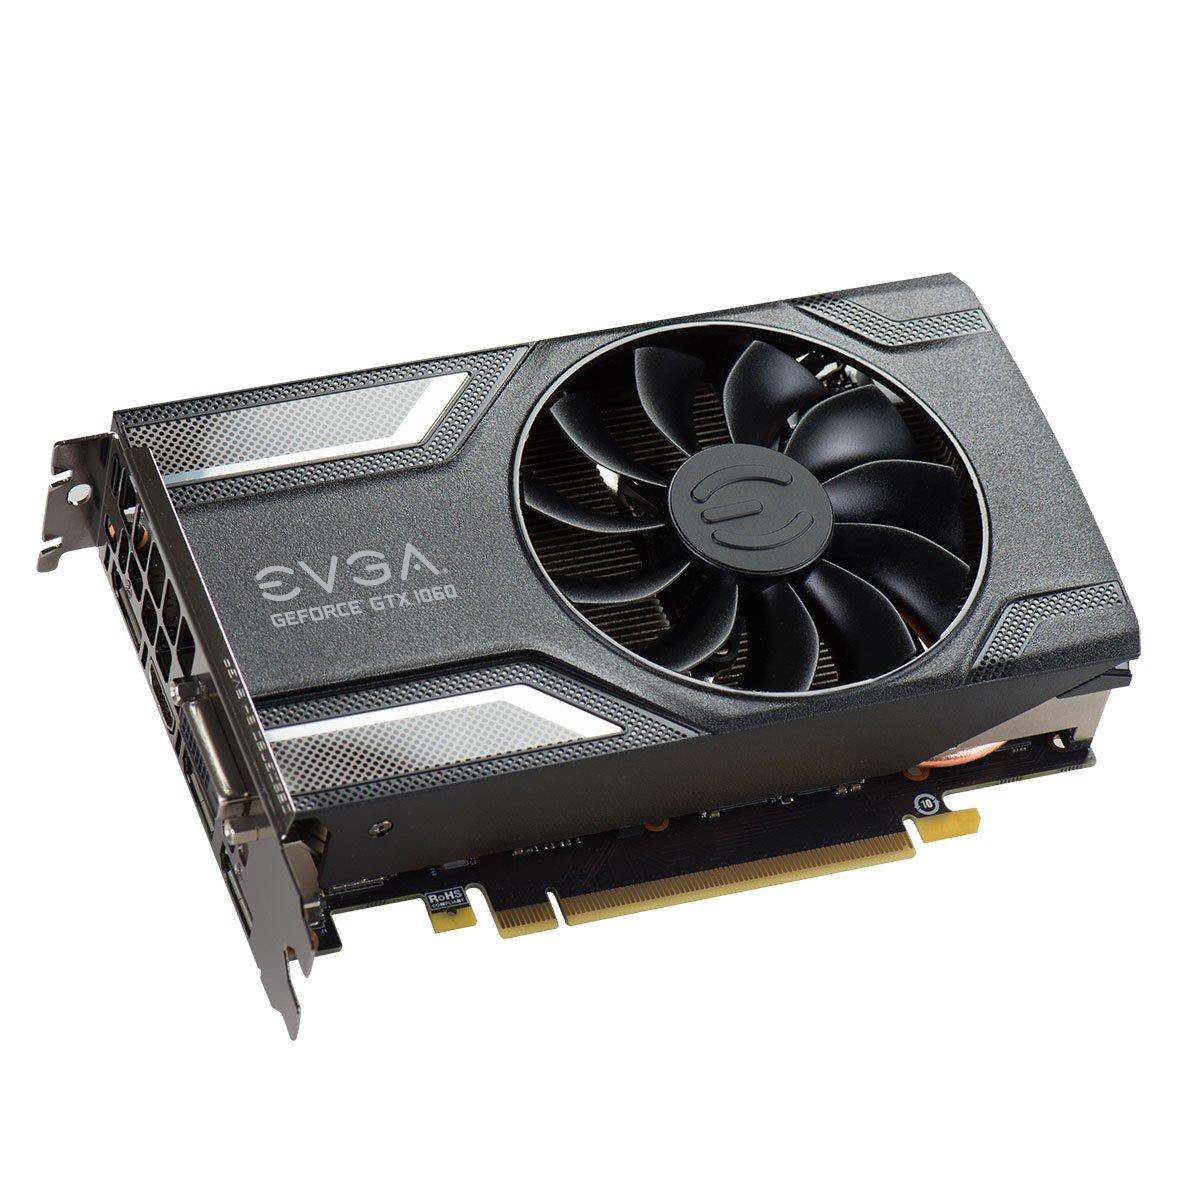 EVGA 06G-P4-6163-KR GeForce GTX 1060 6GB GDDR5 - Tarjeta gráfica (NVIDIA, GeForce GTX 1060, 7680 x 4320 Pixeles, 7680 x 4320 Pixeles, GDDR5, PCI ...